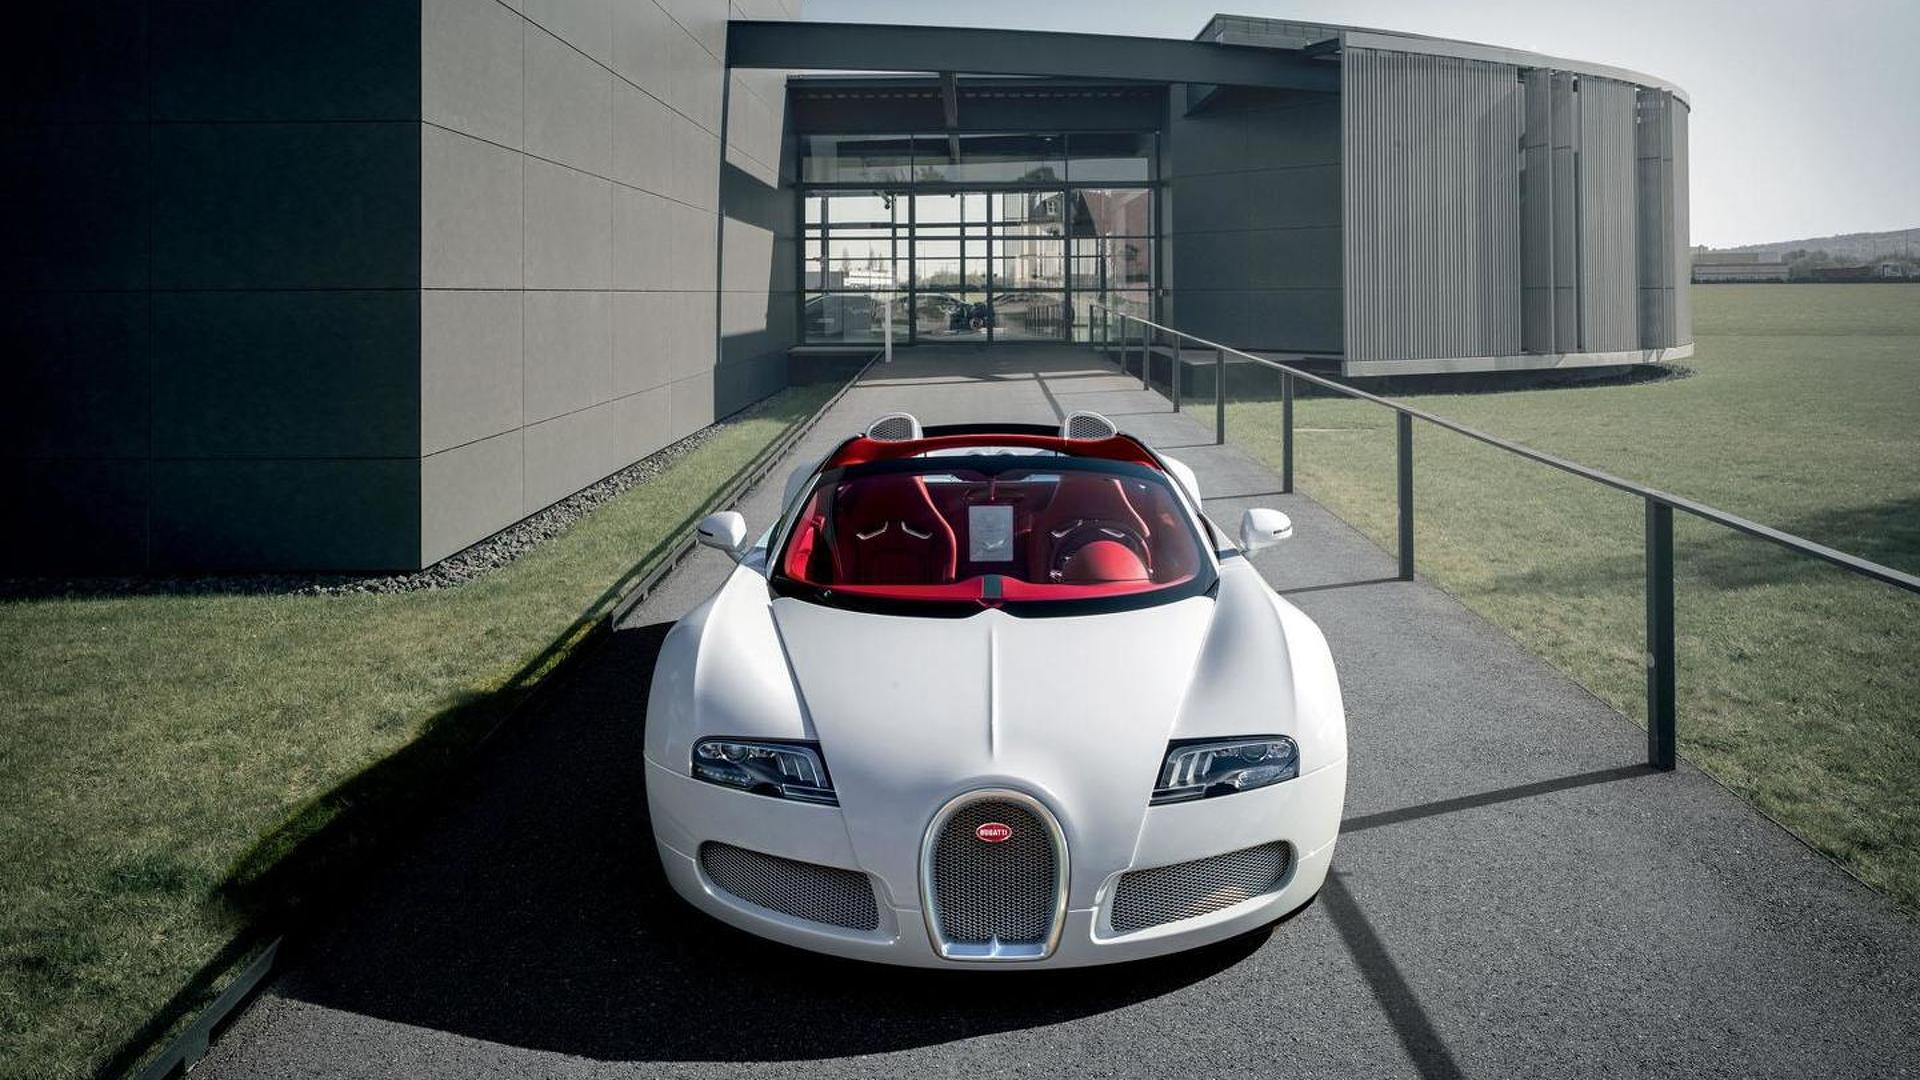 2012-310991-bugatti-veyron-grand-sport-wei-long-special-edition-23-4-20121 Amazing Bugatti Veyron Price In Australia Cars Trend